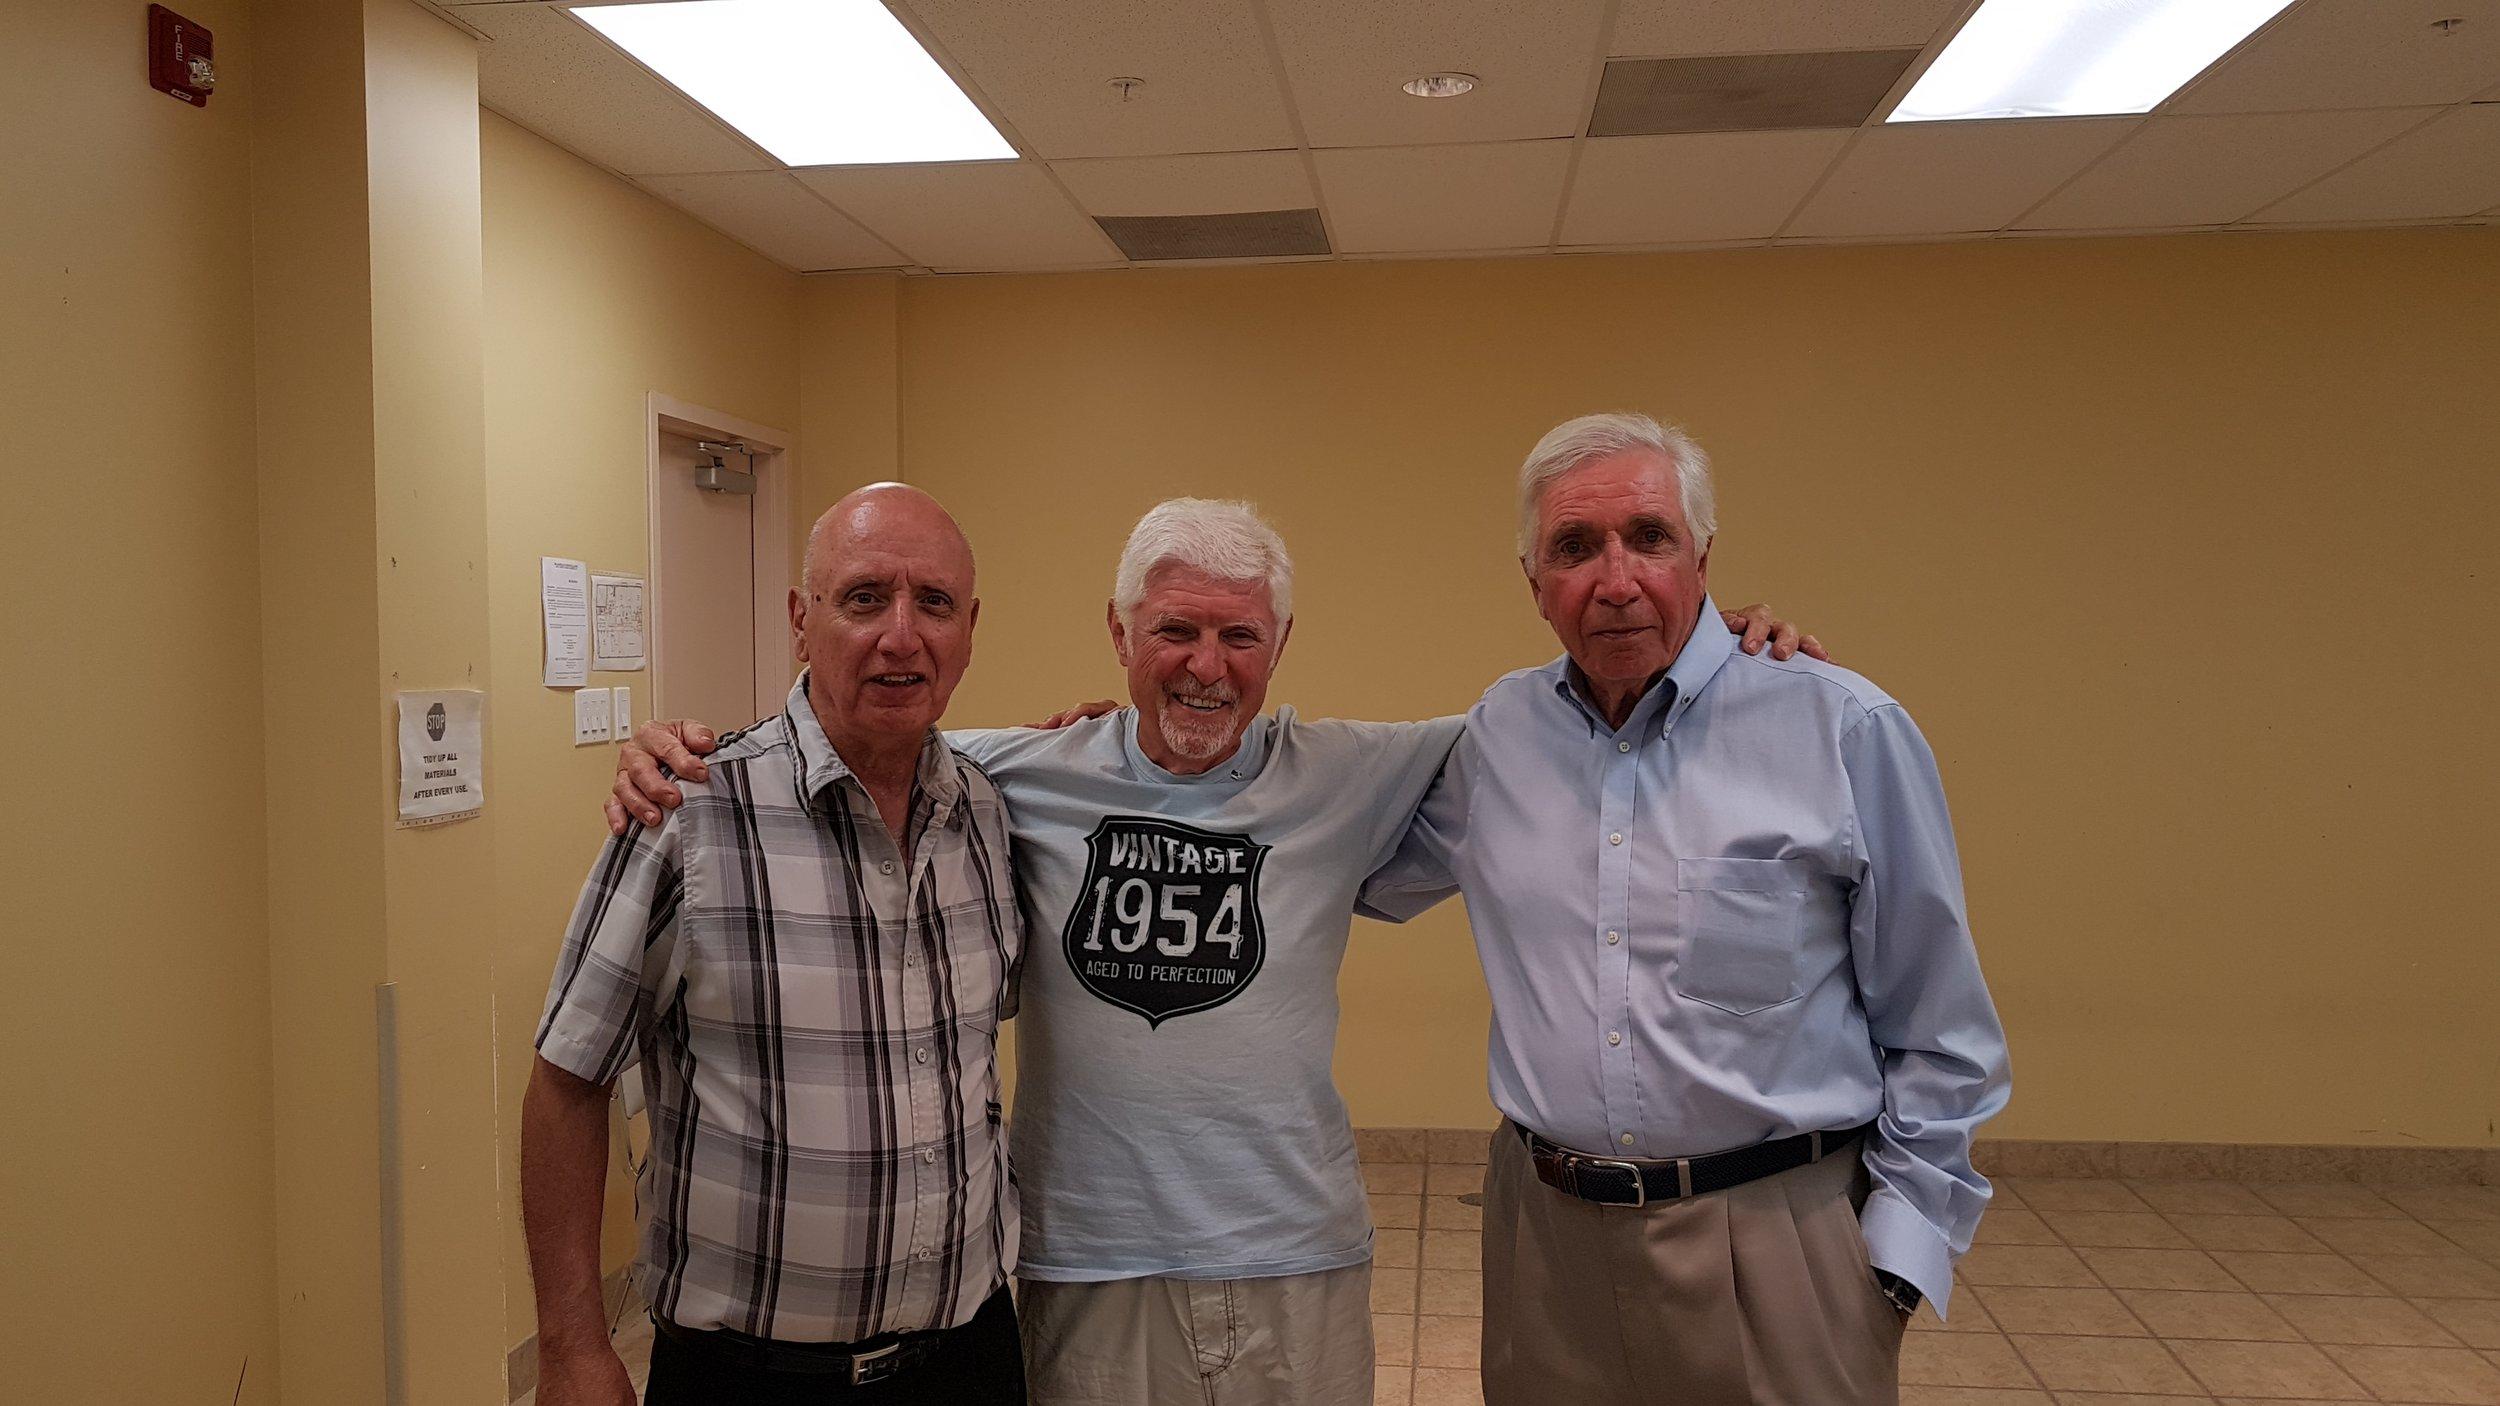 Welcome new Brother Knights, Greg Gould, Liborio Celenza, and Bob Heimler